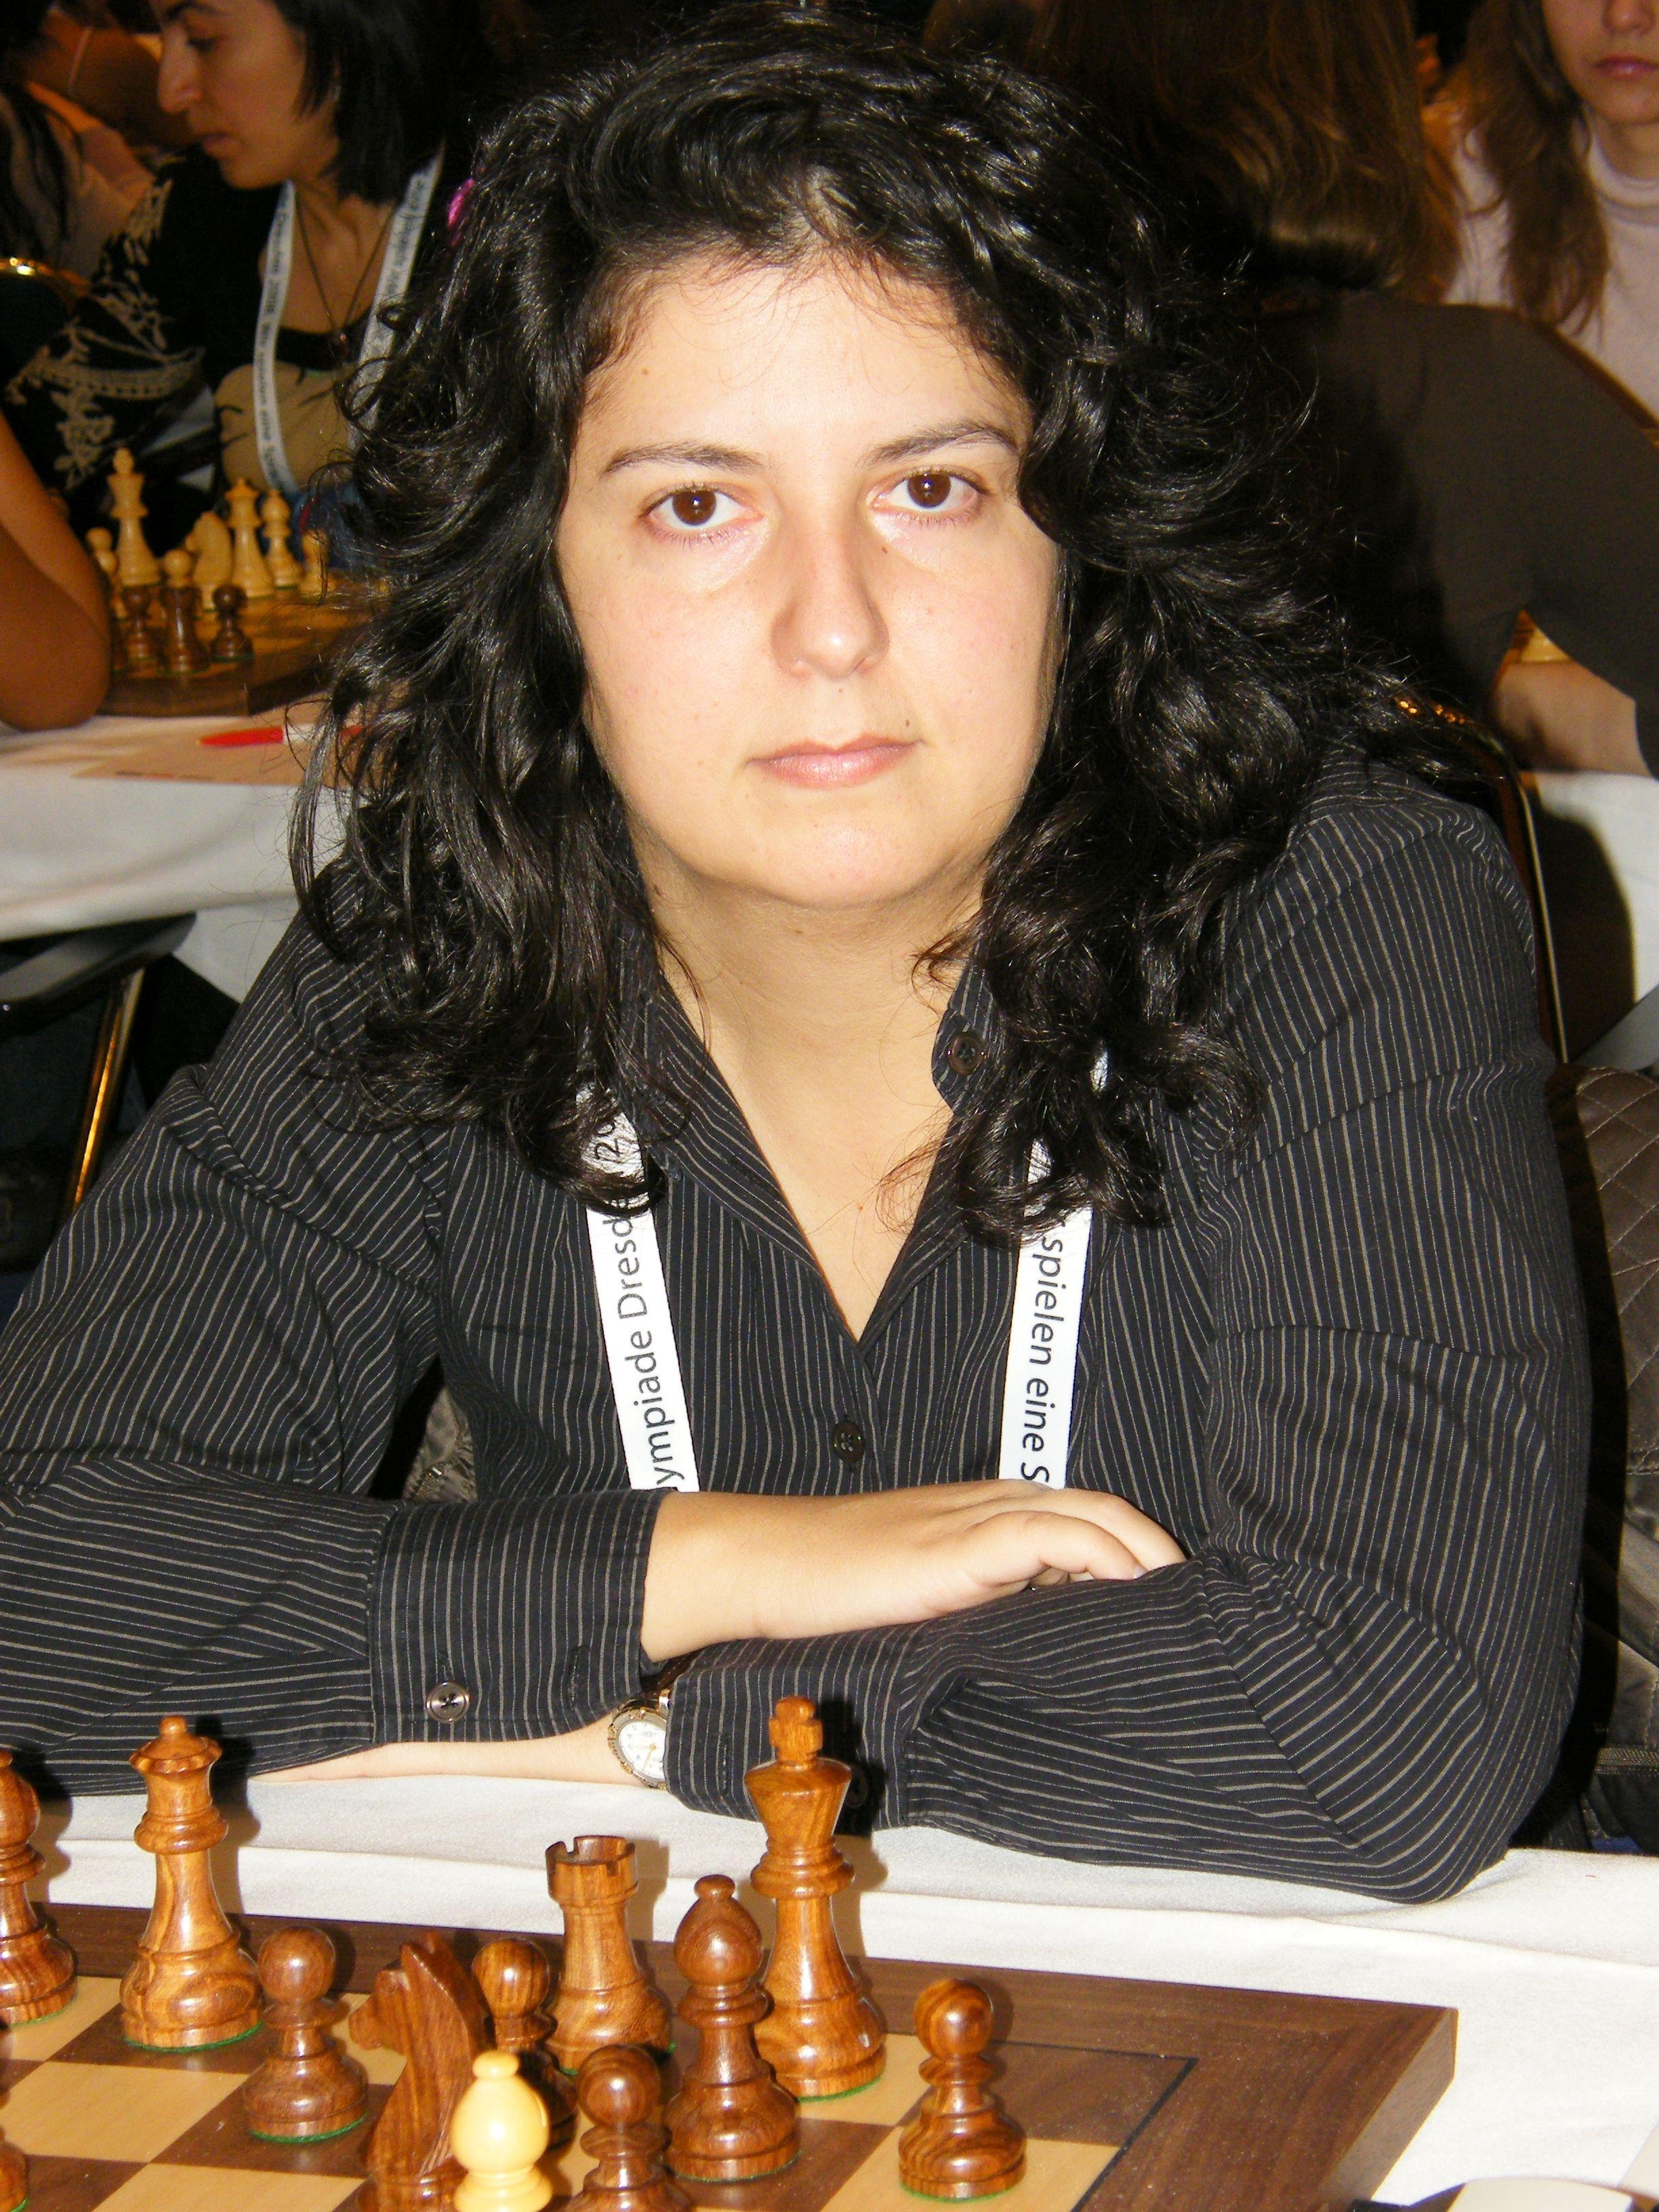 Картинки по запросу fotos Calzetta Ruiz Monica chess